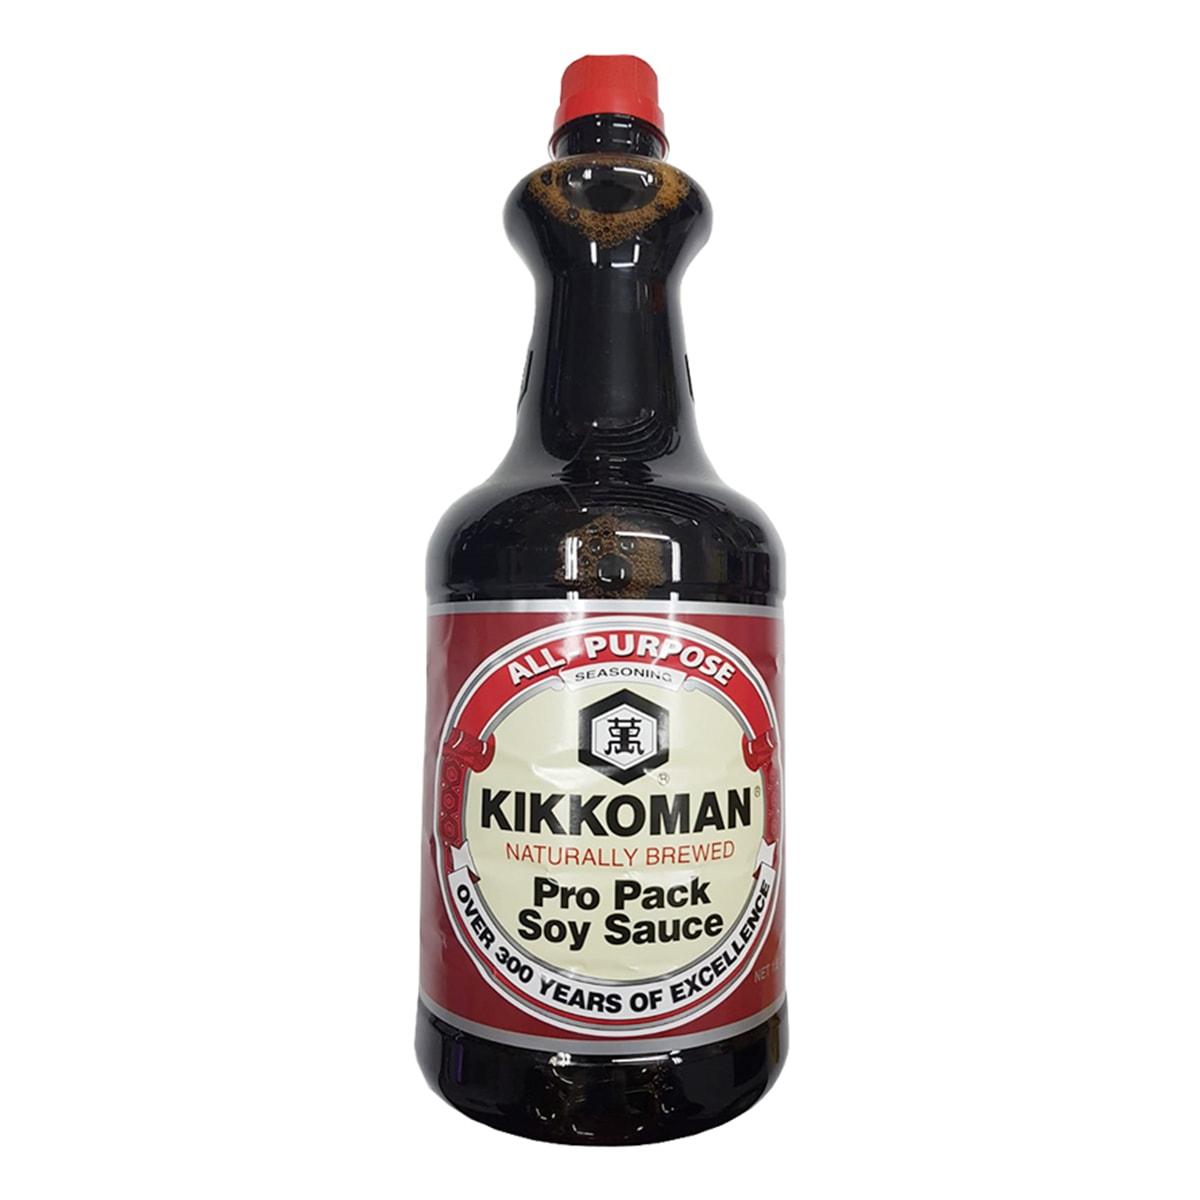 Buy Kikkoman Pro Pack Soy Sauce - 1.6 Litre